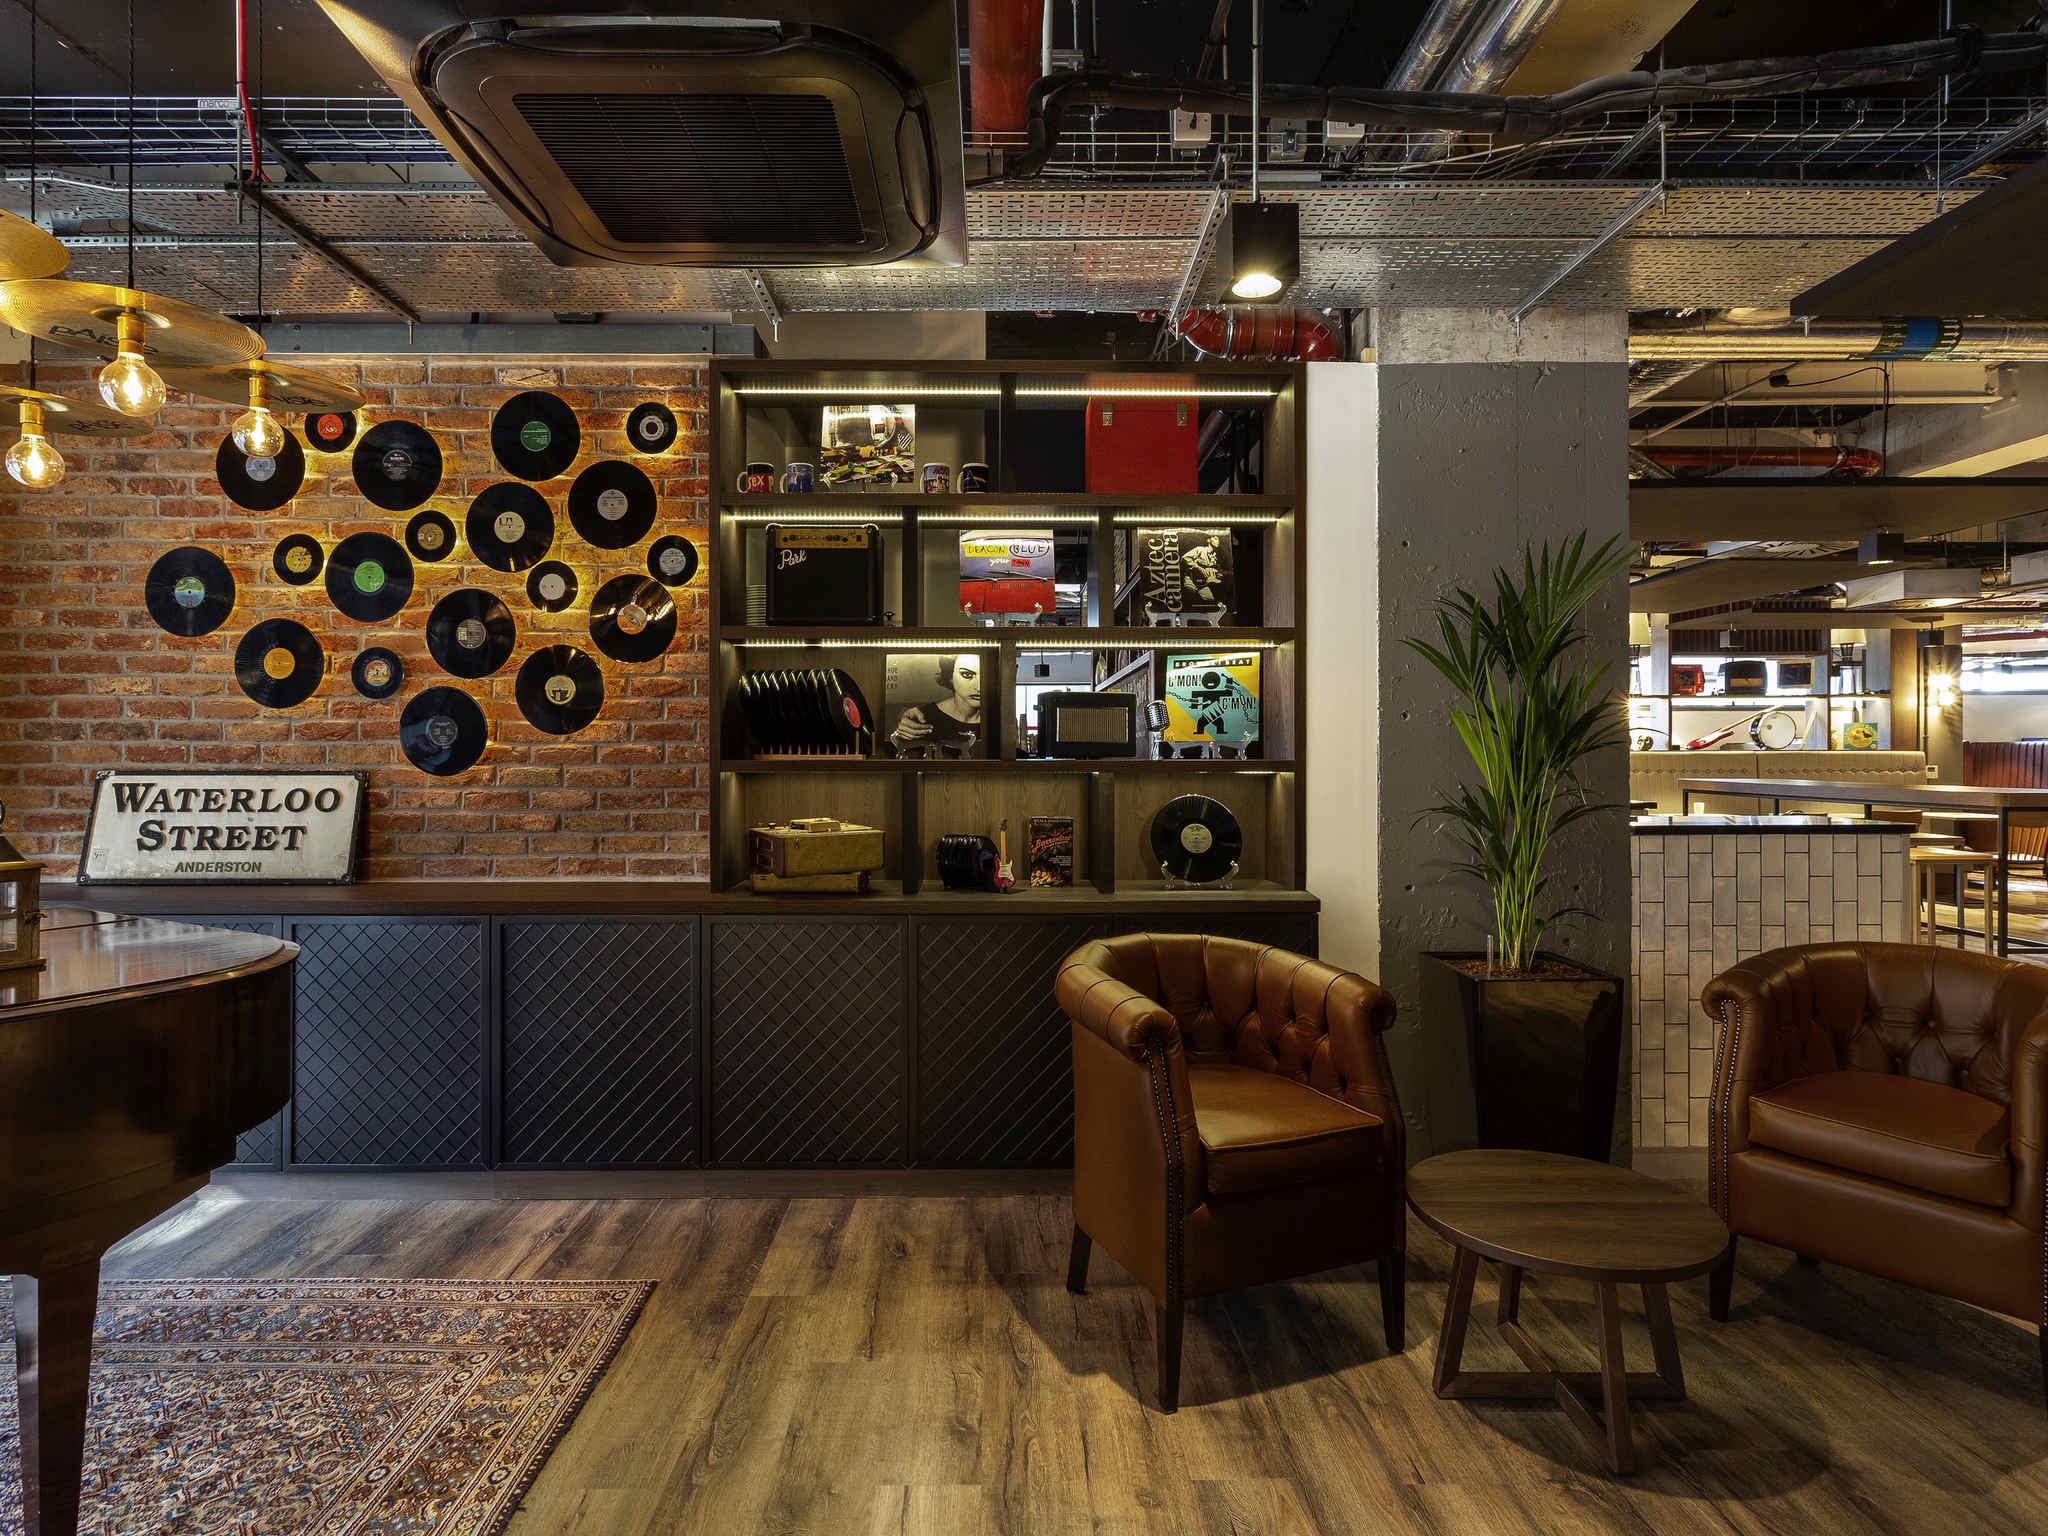 sofa shops glasgow city centre slumberland com sofas 2 hotel in ibis styles west